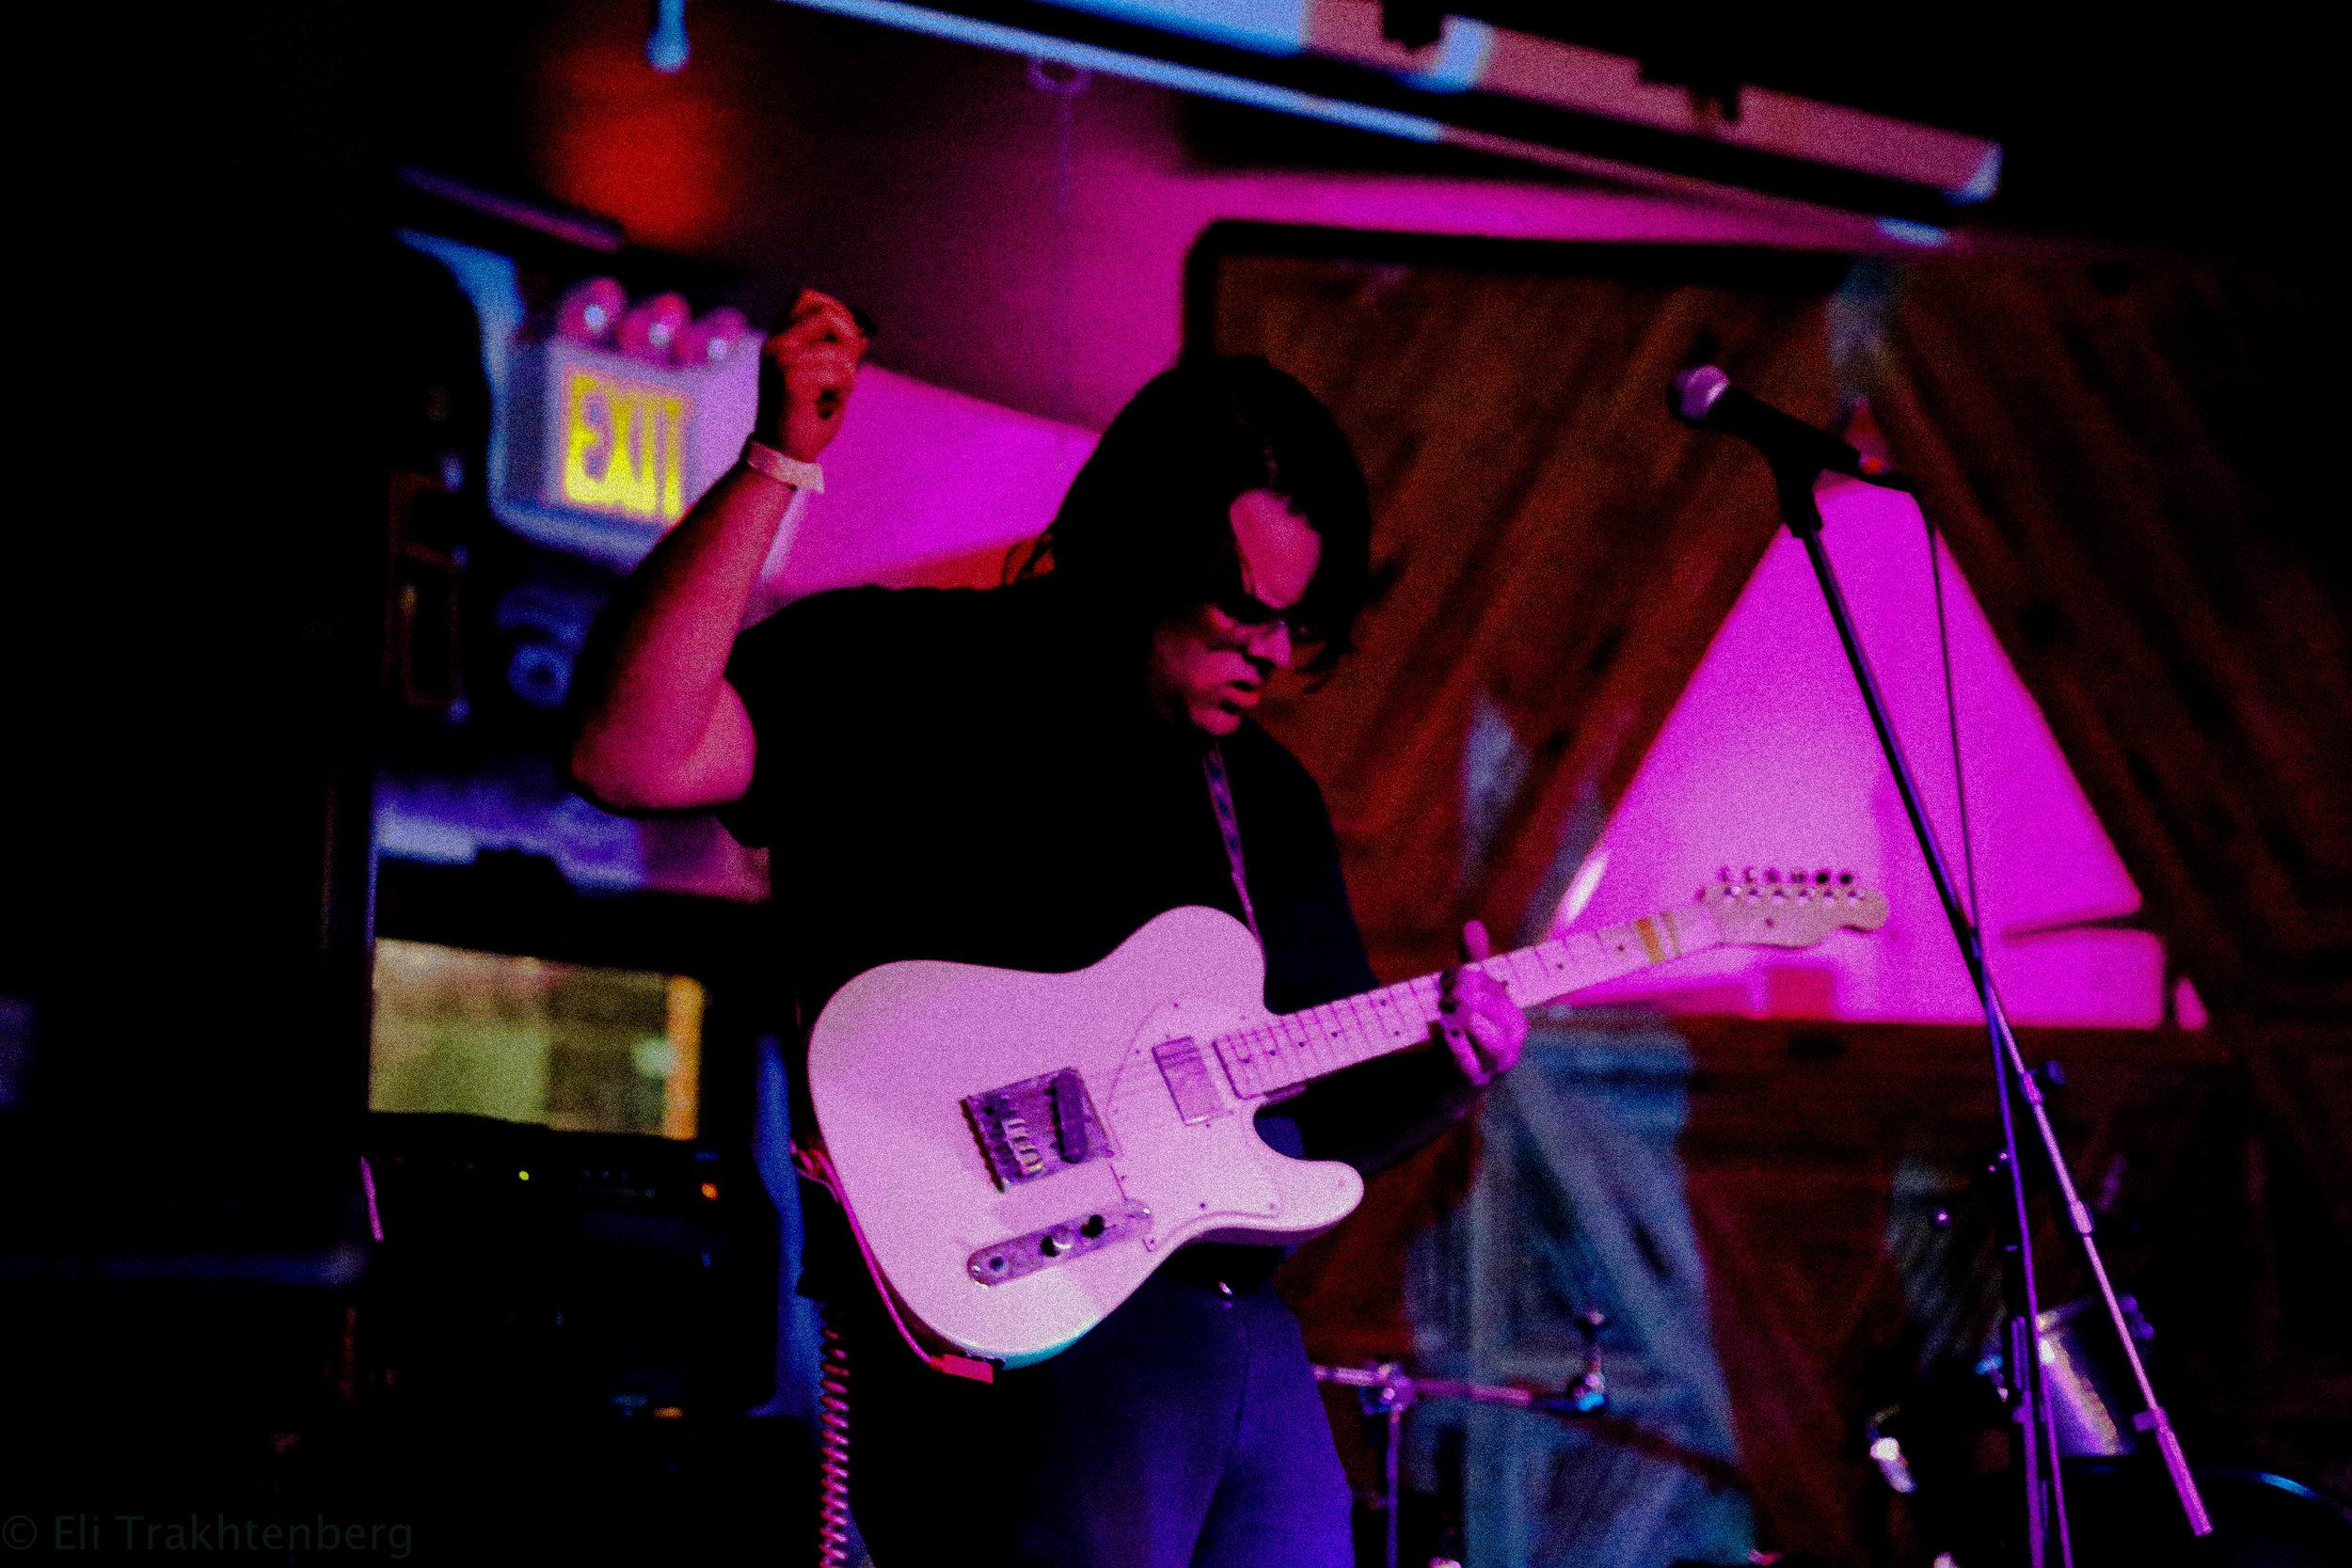 Alex Mercuri  (Guitar/Vox) of Sailor Boyfriend    Photo Credit : Eli Trakhtenberg